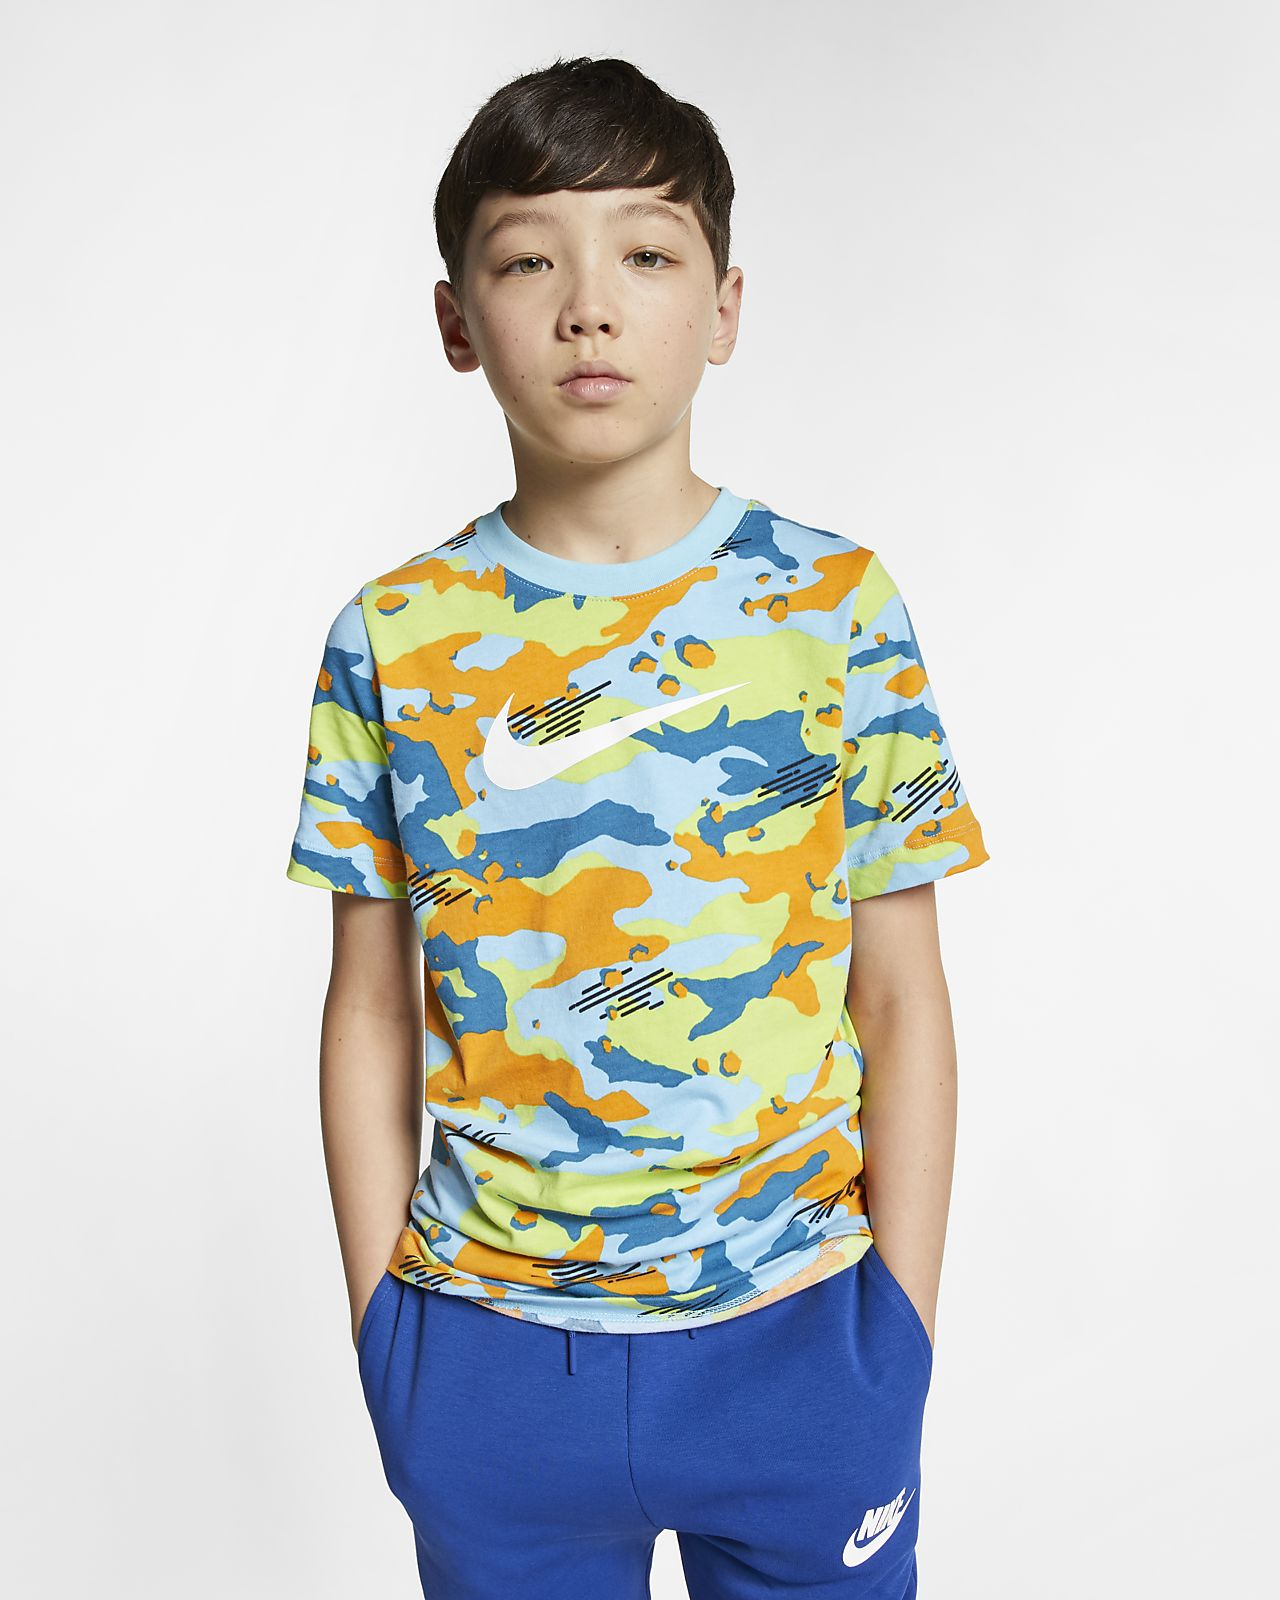 Playera camuflada para niño talla grande Nike Sportswear